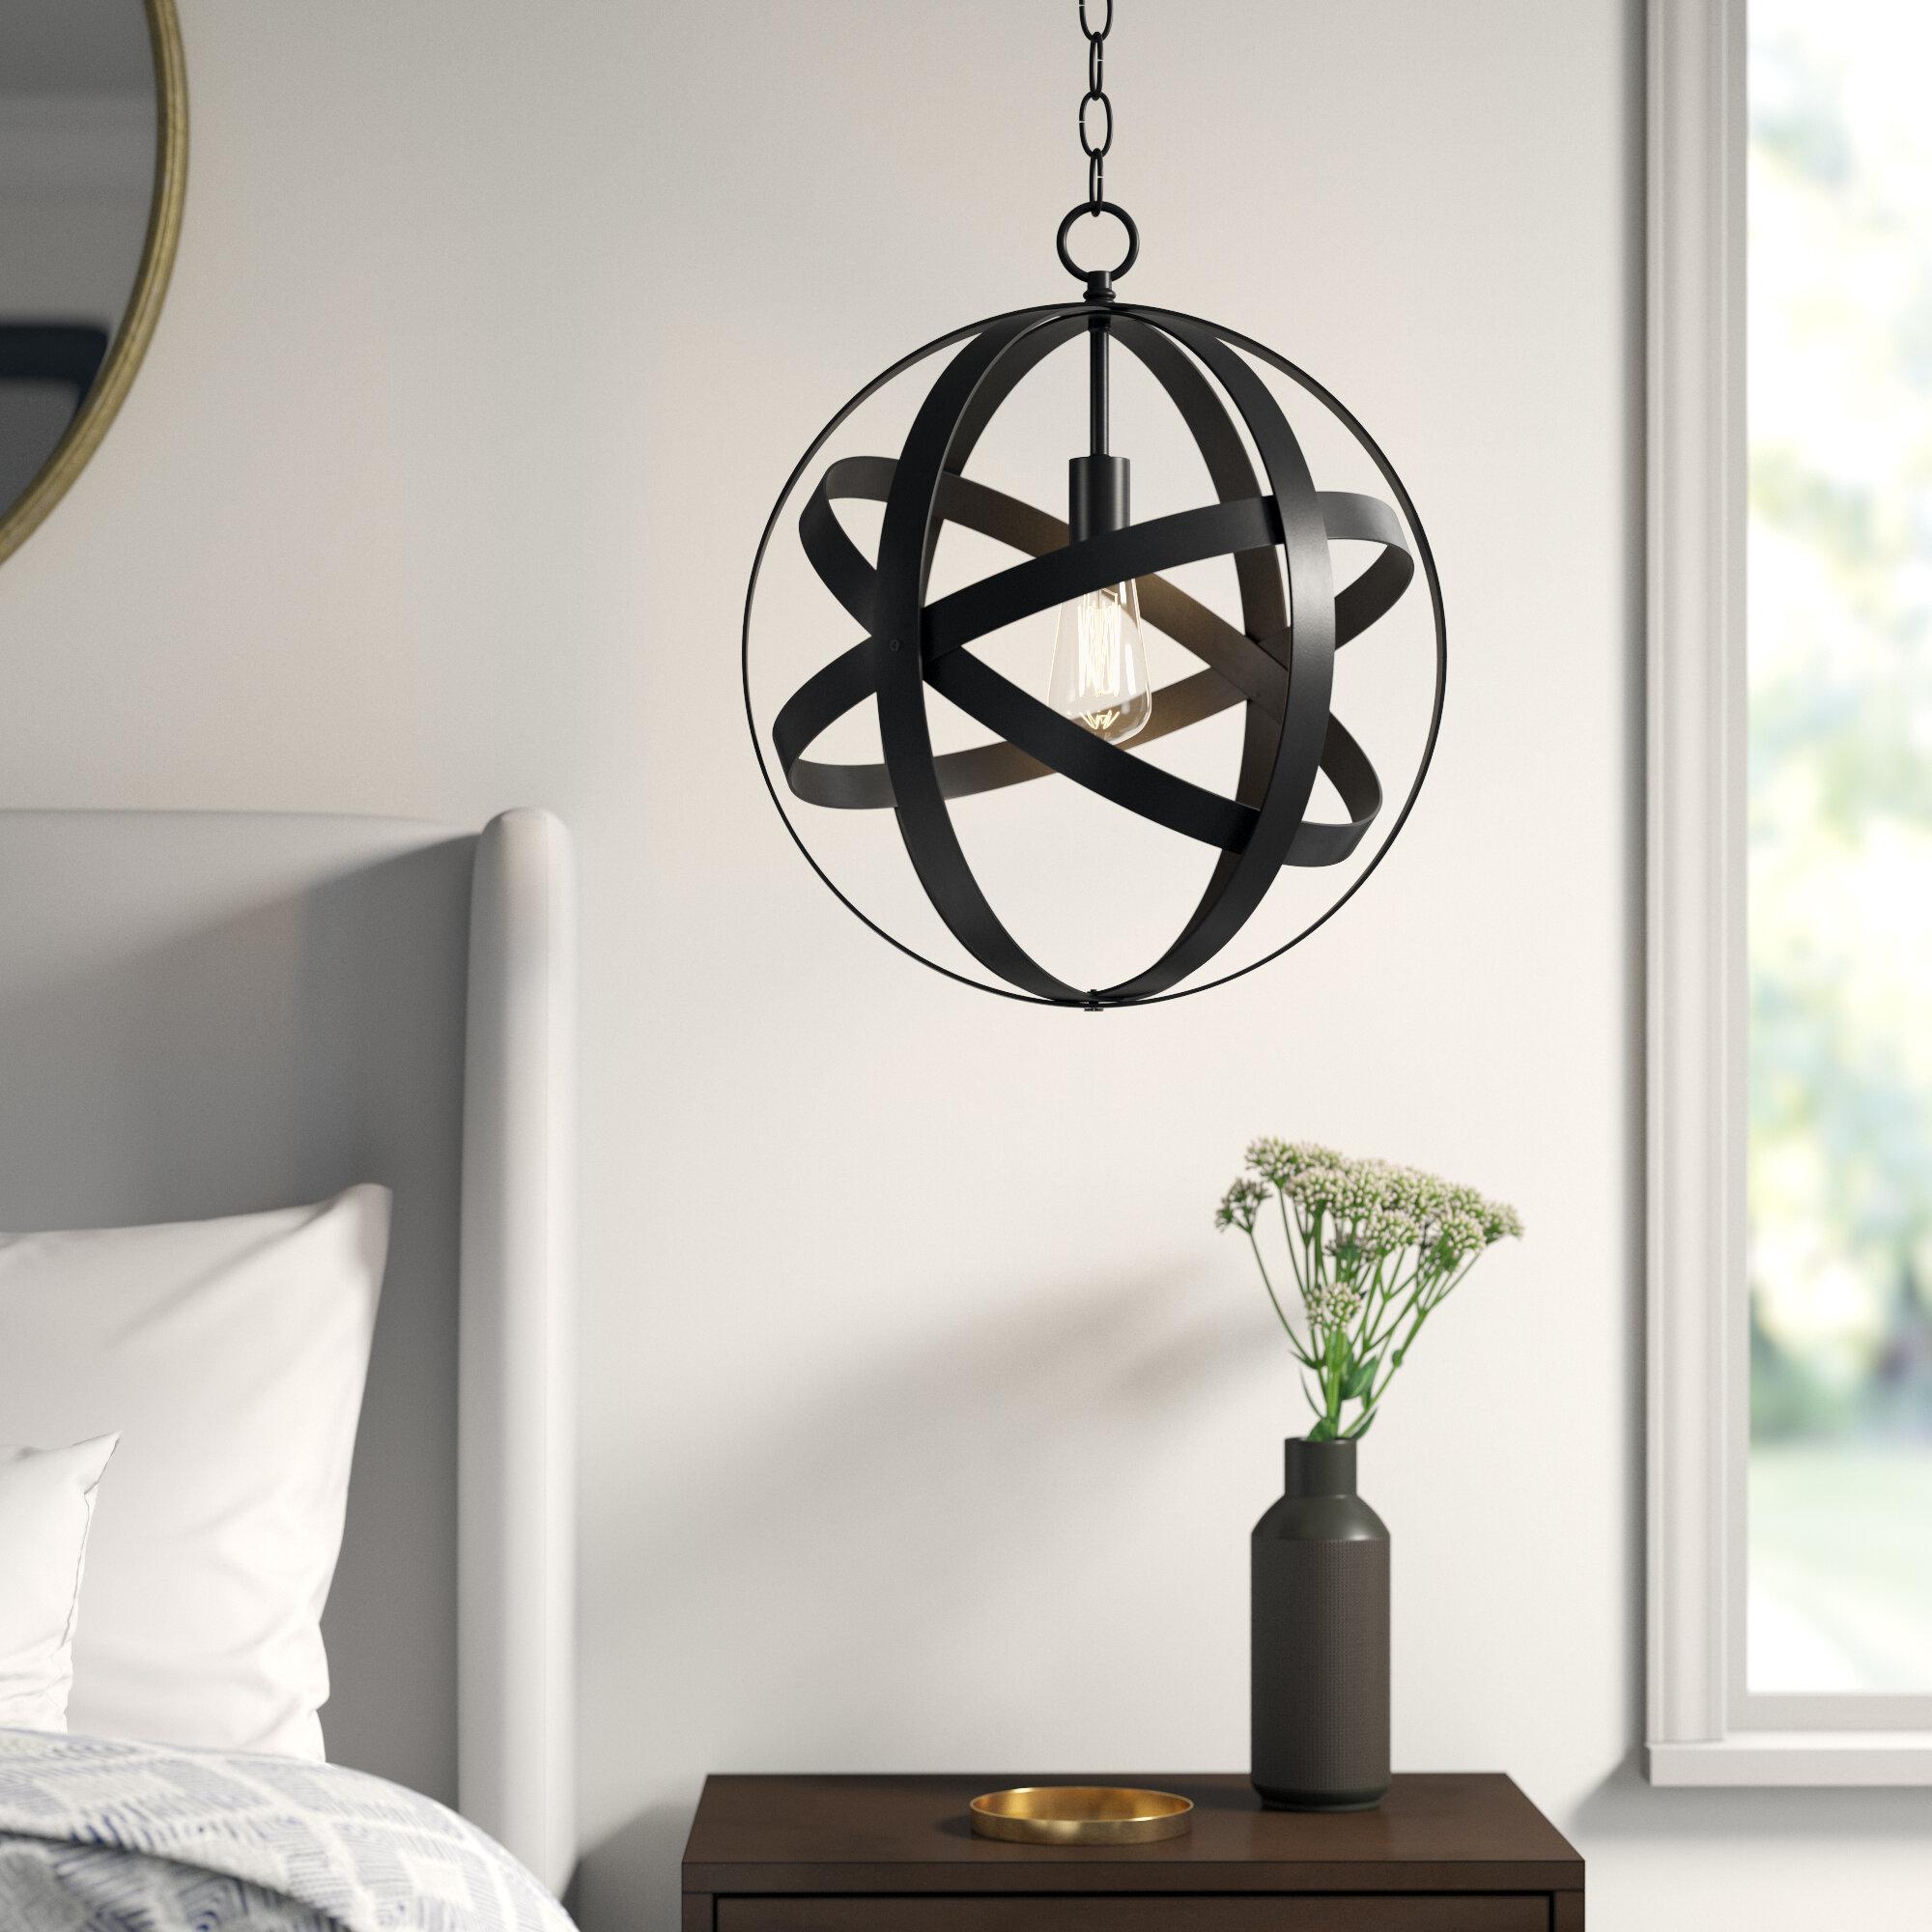 Ealey 1 Light Globe Pendant Throughout Irwin 1 Light Single Globe Pendants (Gallery 14 of 30)